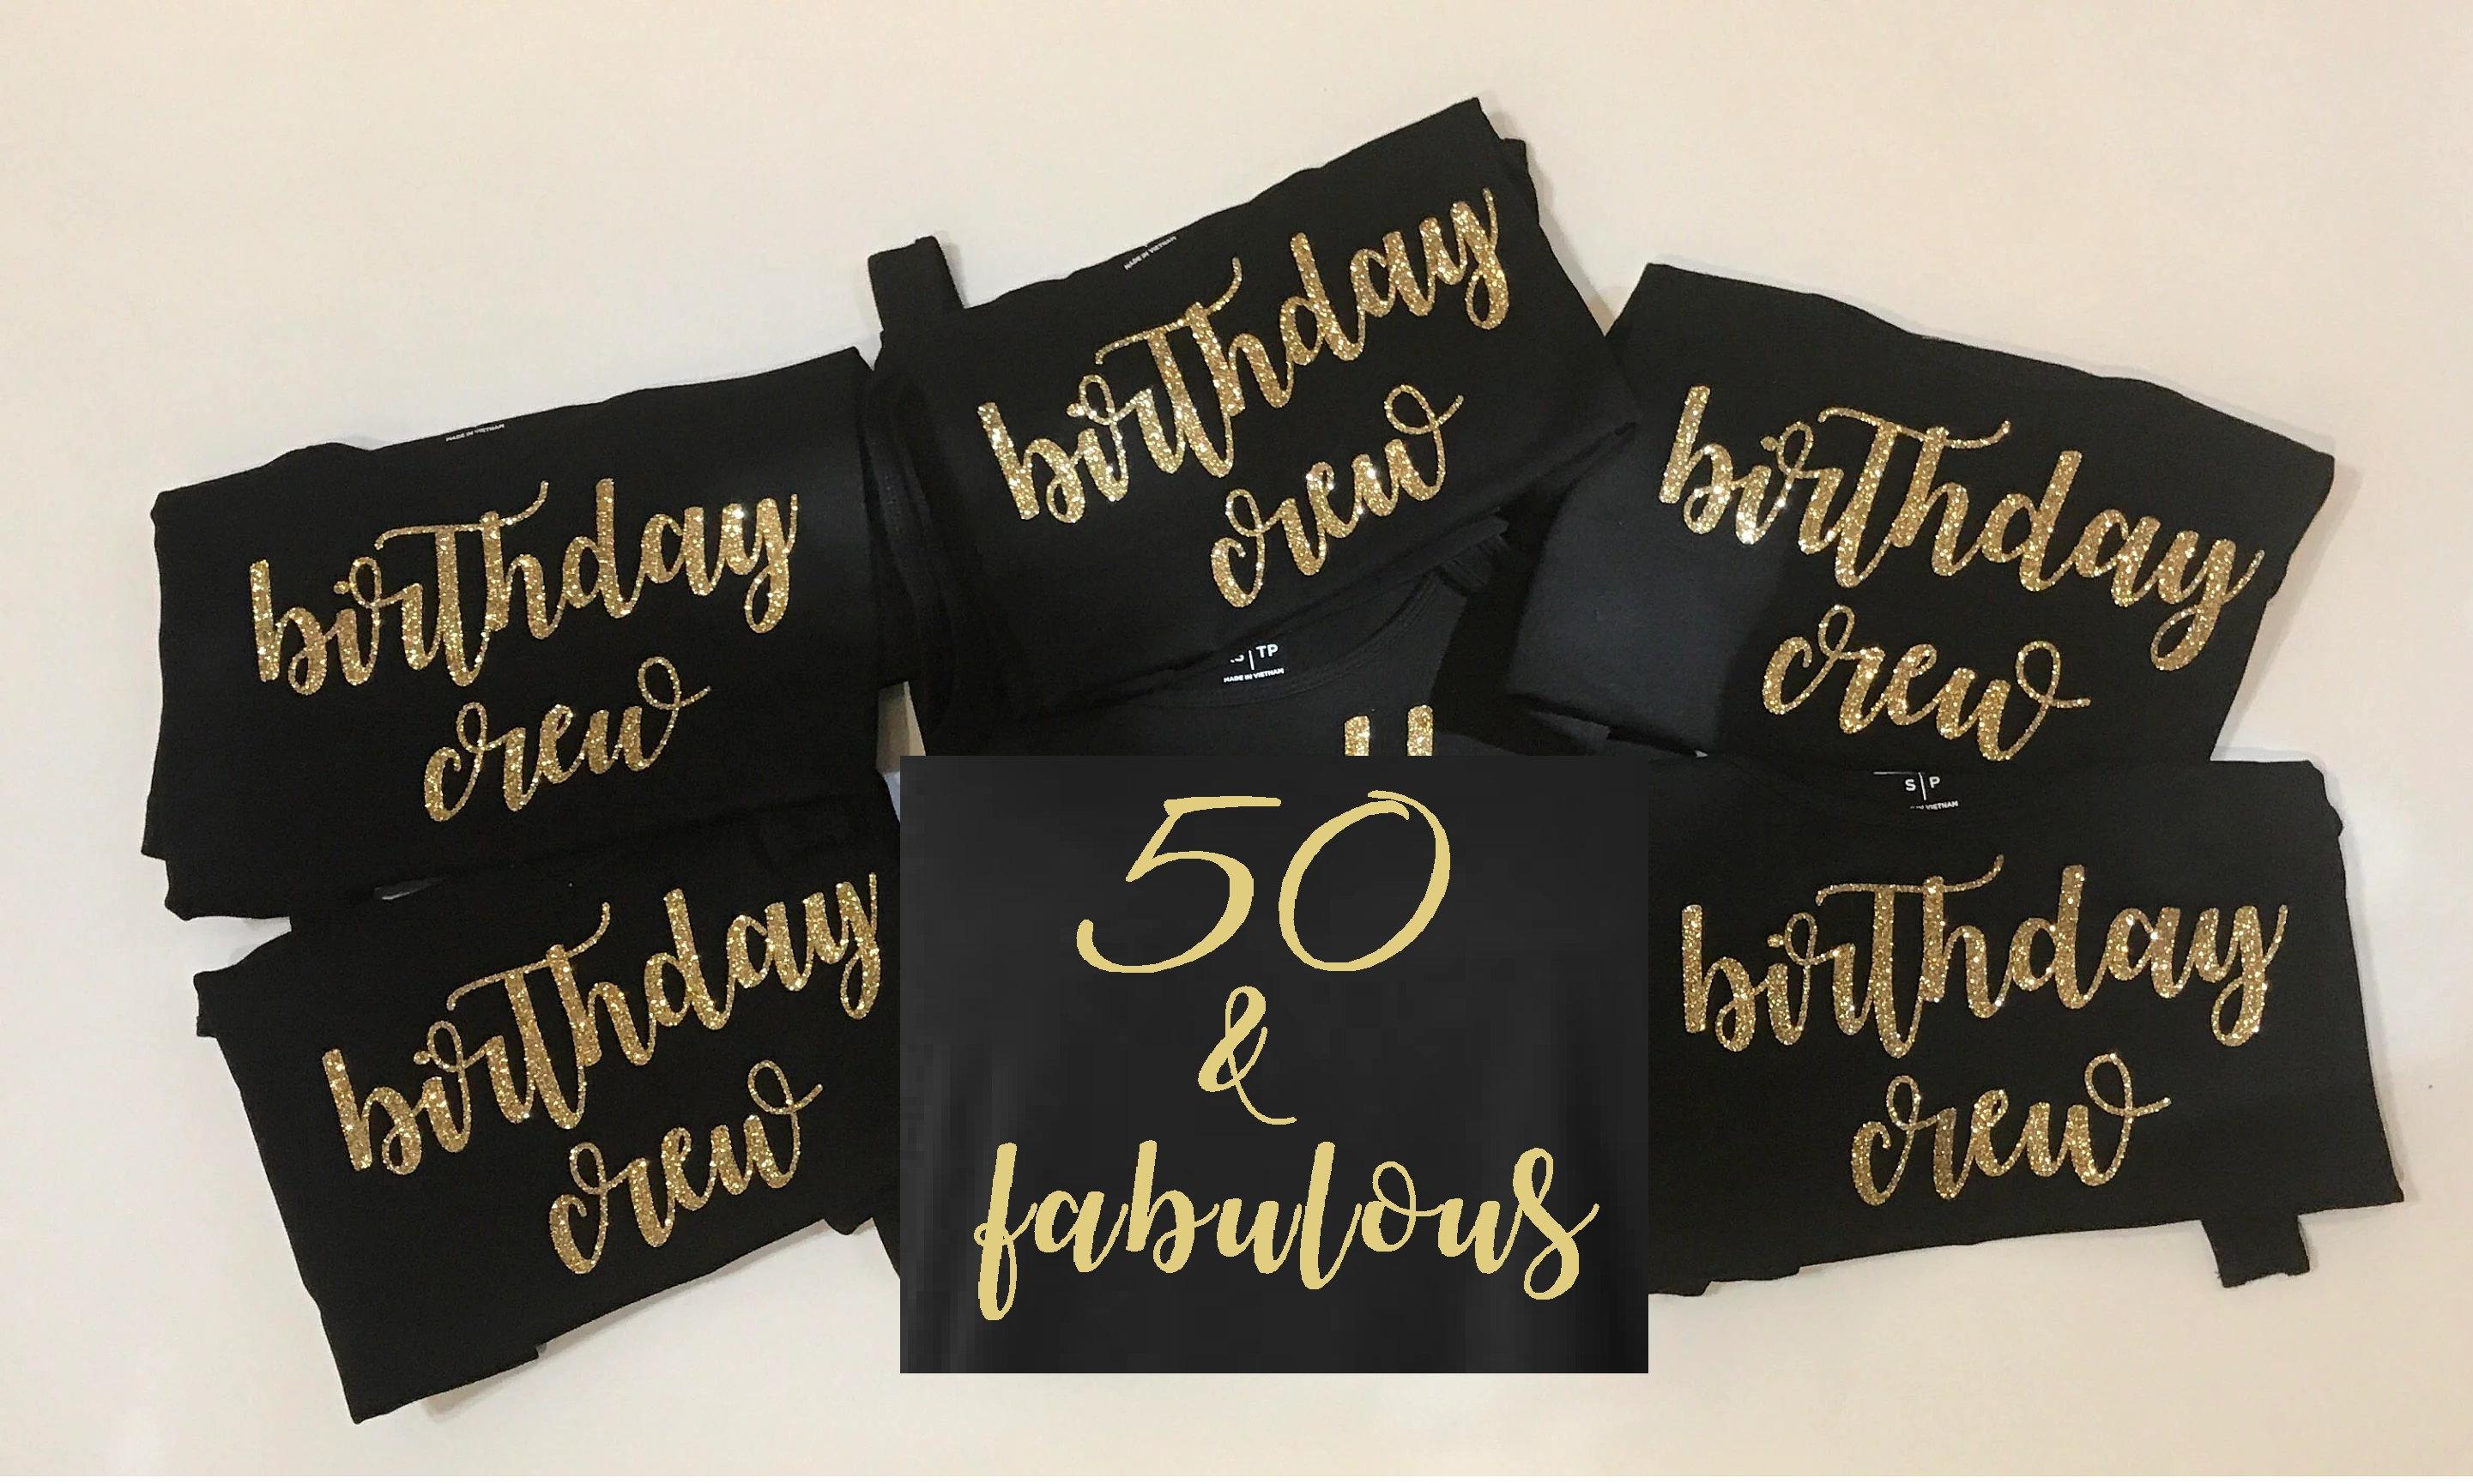 3419857f2 Birthday Crew Group of Birthday Crew + 50 & Fabulous Glitter Shirts |  Birthday Bedazzled T Shirts | 50th Birthday Shirt